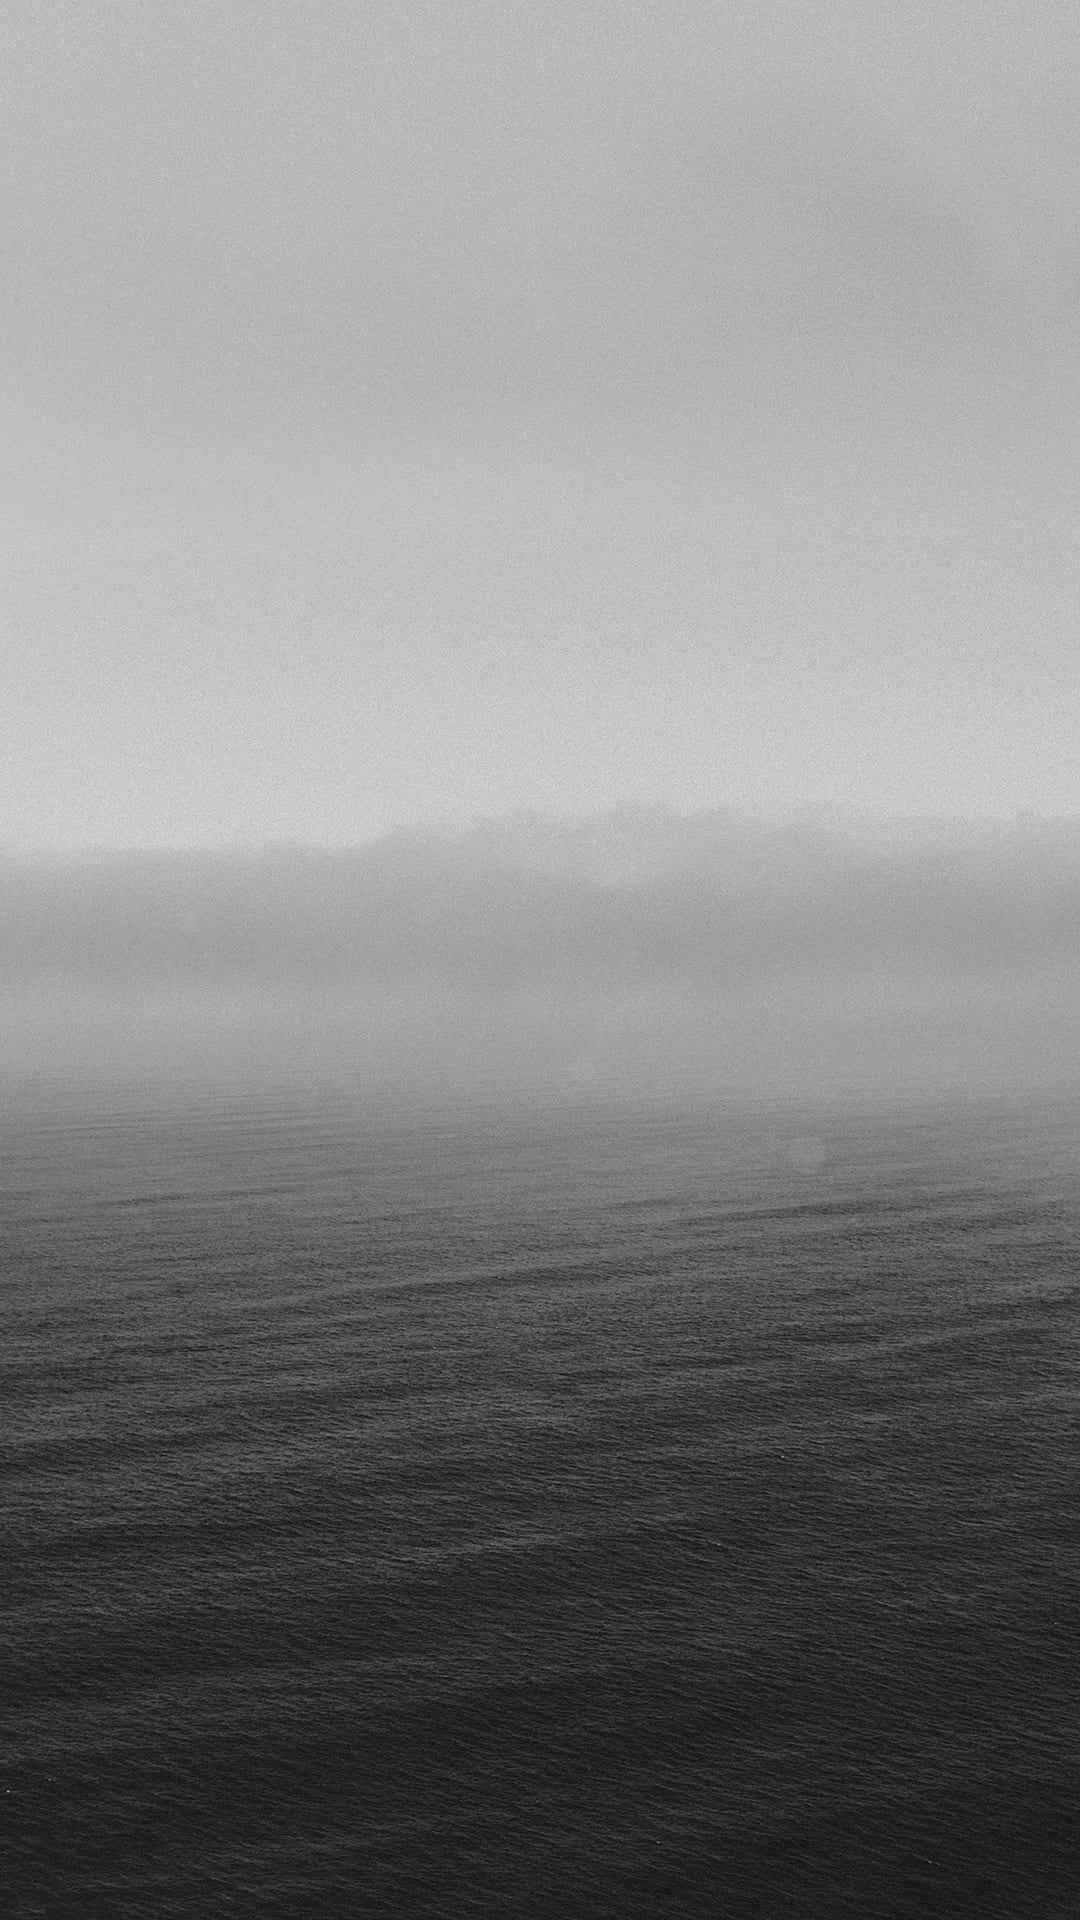 обои на айфон море океан